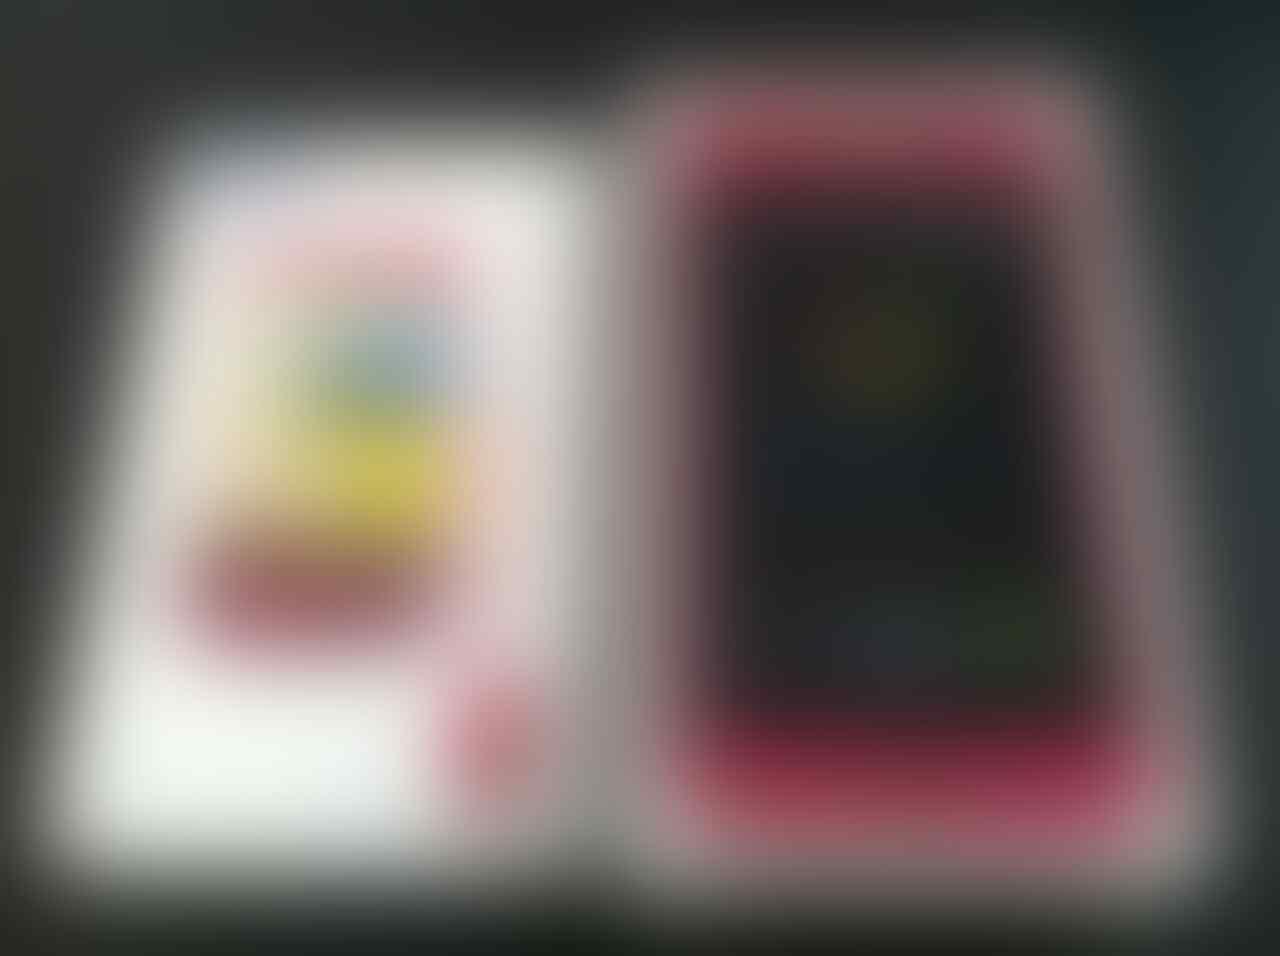 Samsung Galaxy Note pink harga 3,5jt hub/sms: 082 326 554 497